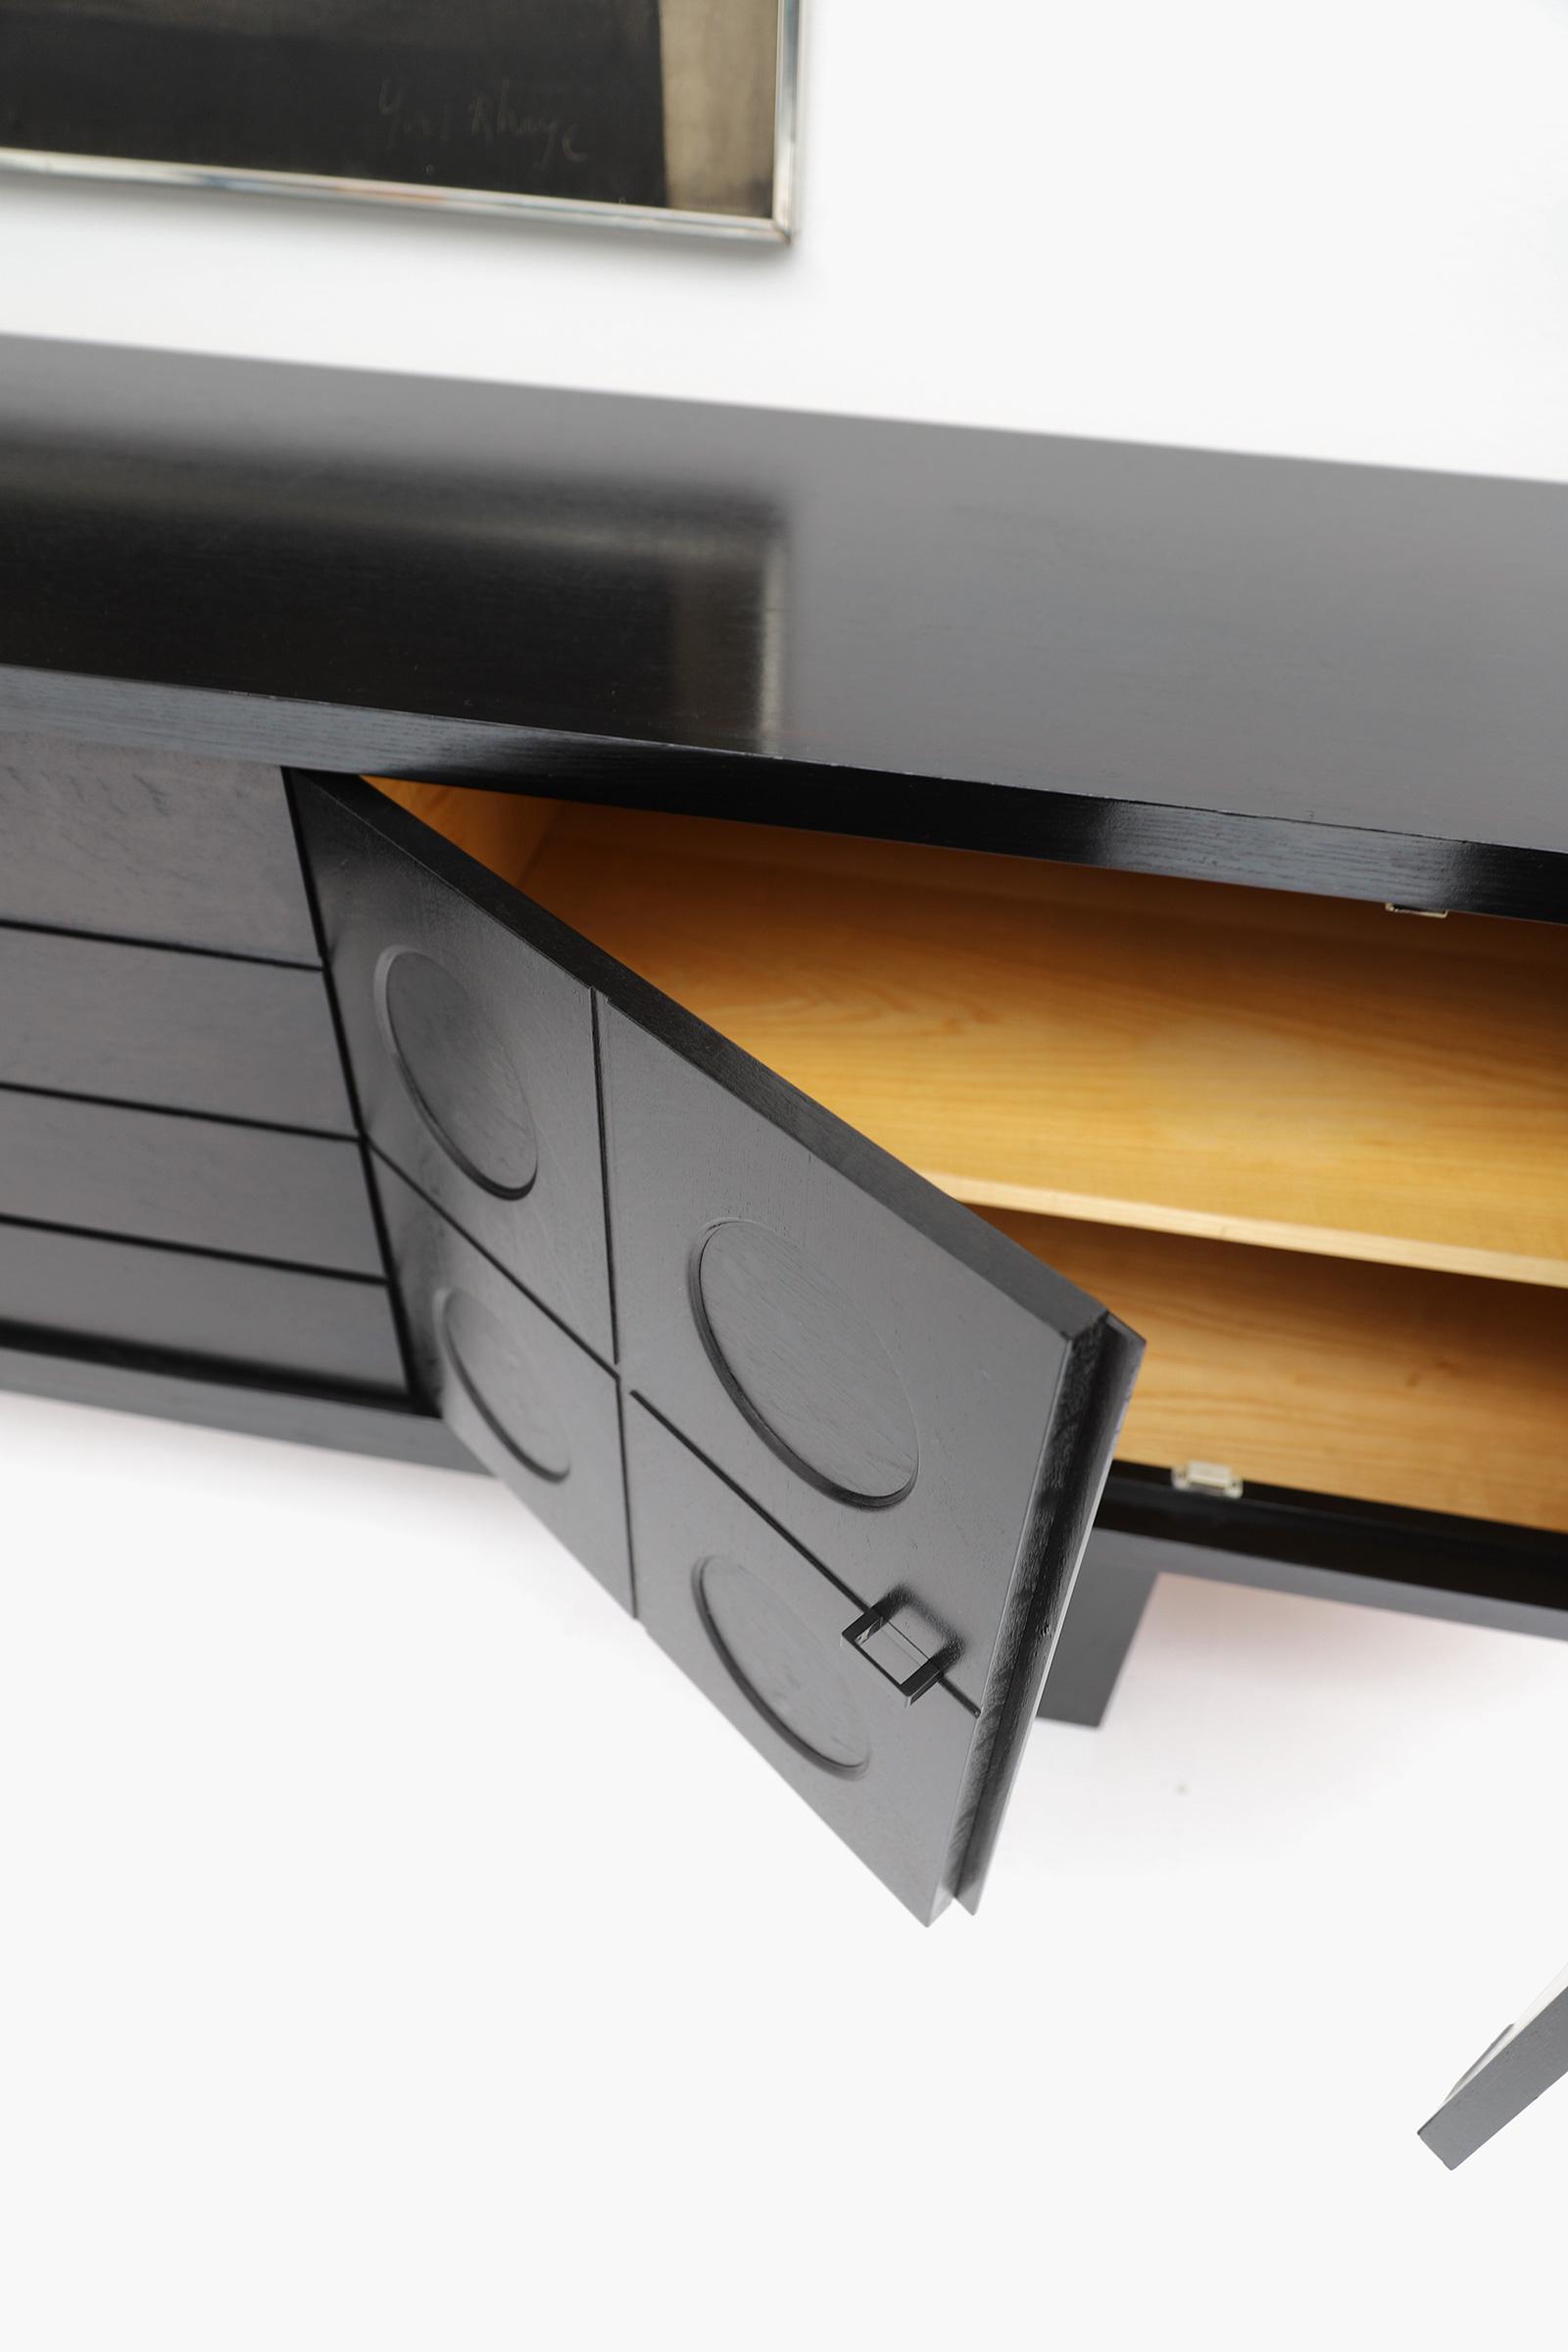 70s Sideboard with Geometrical Doorsimage 9